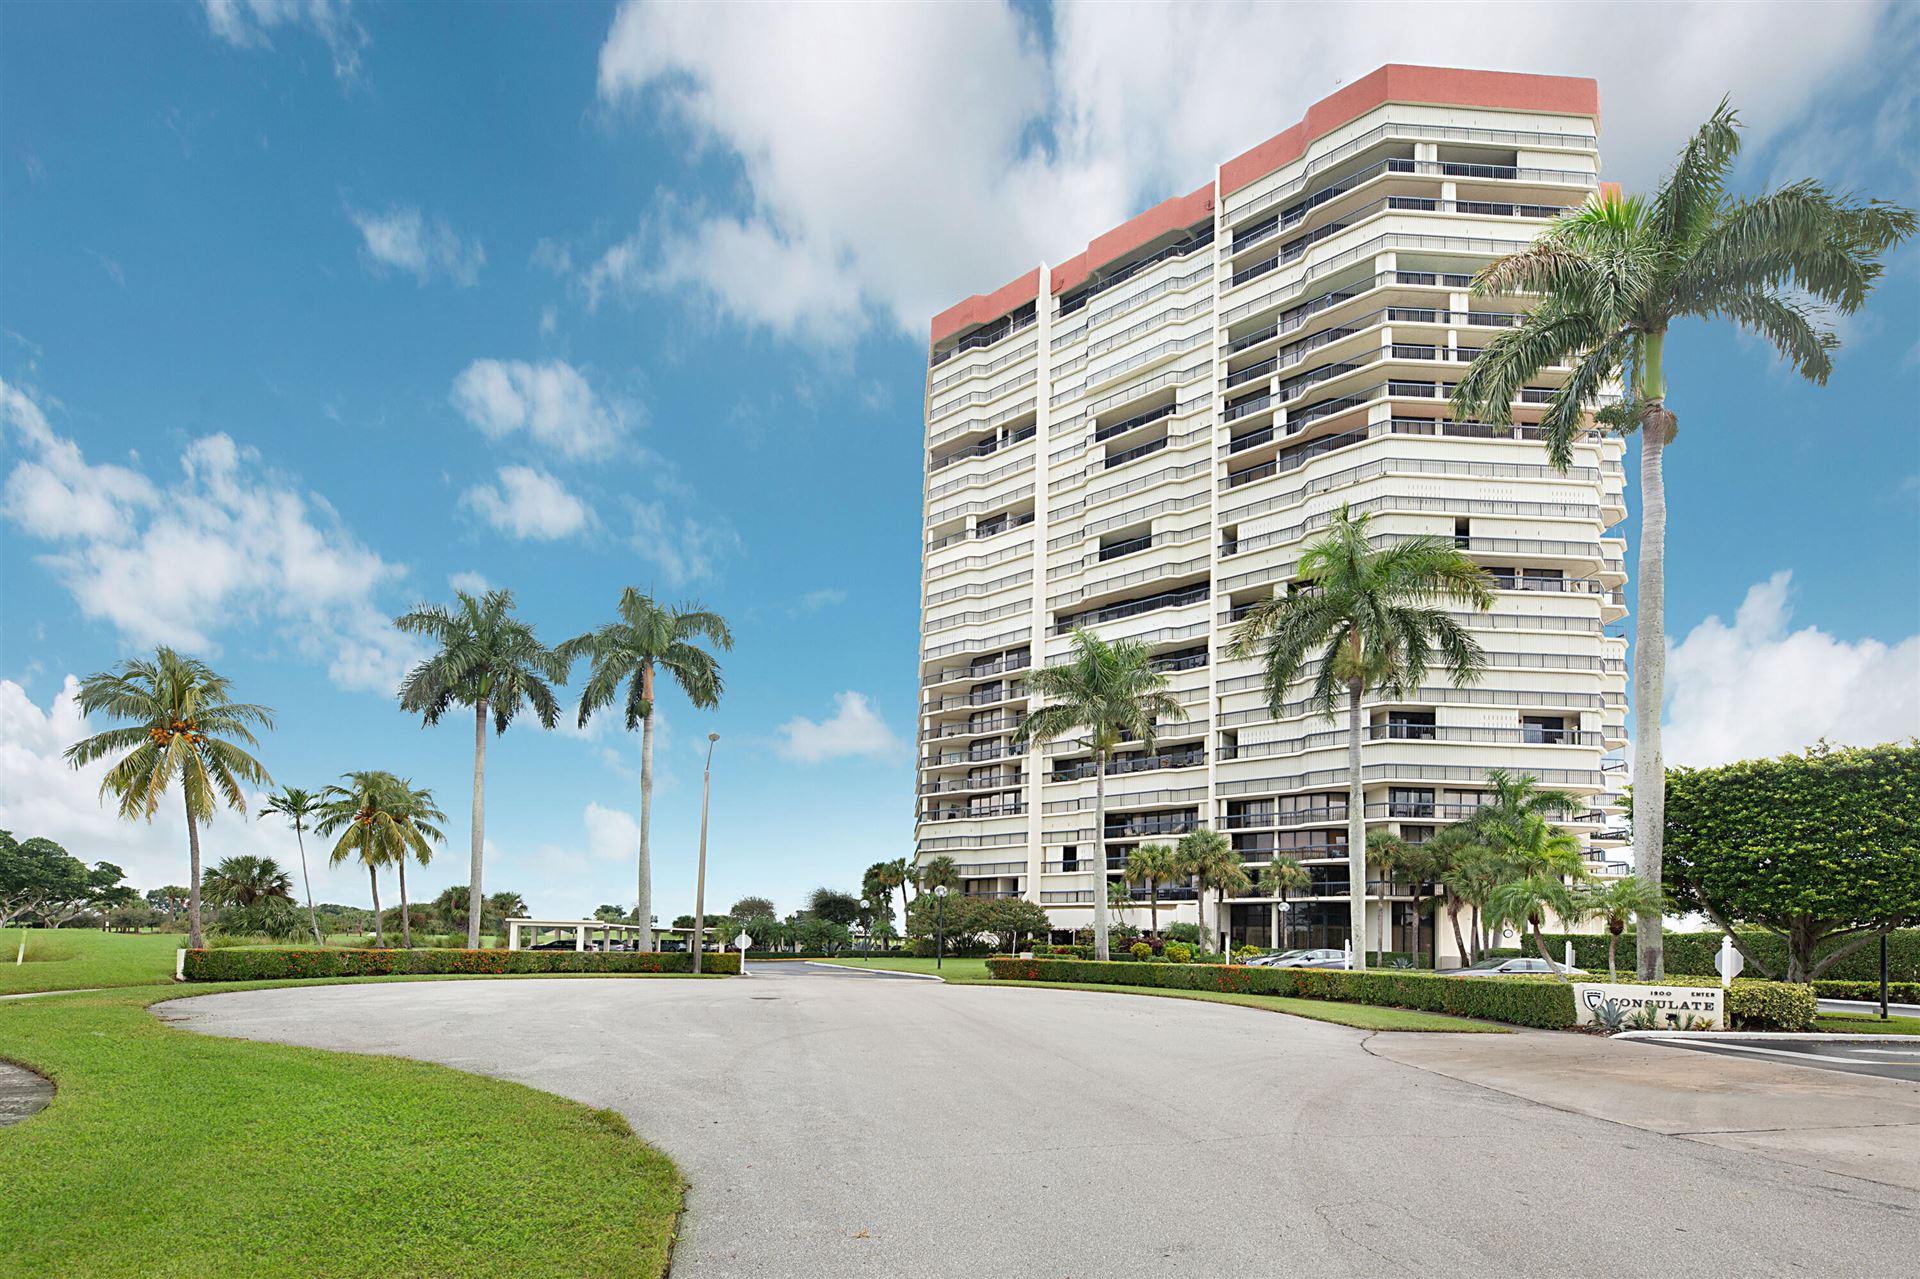 1900 Consulate Place #805, West Palm Beach, FL 33401 - MLS#: RX-10729408